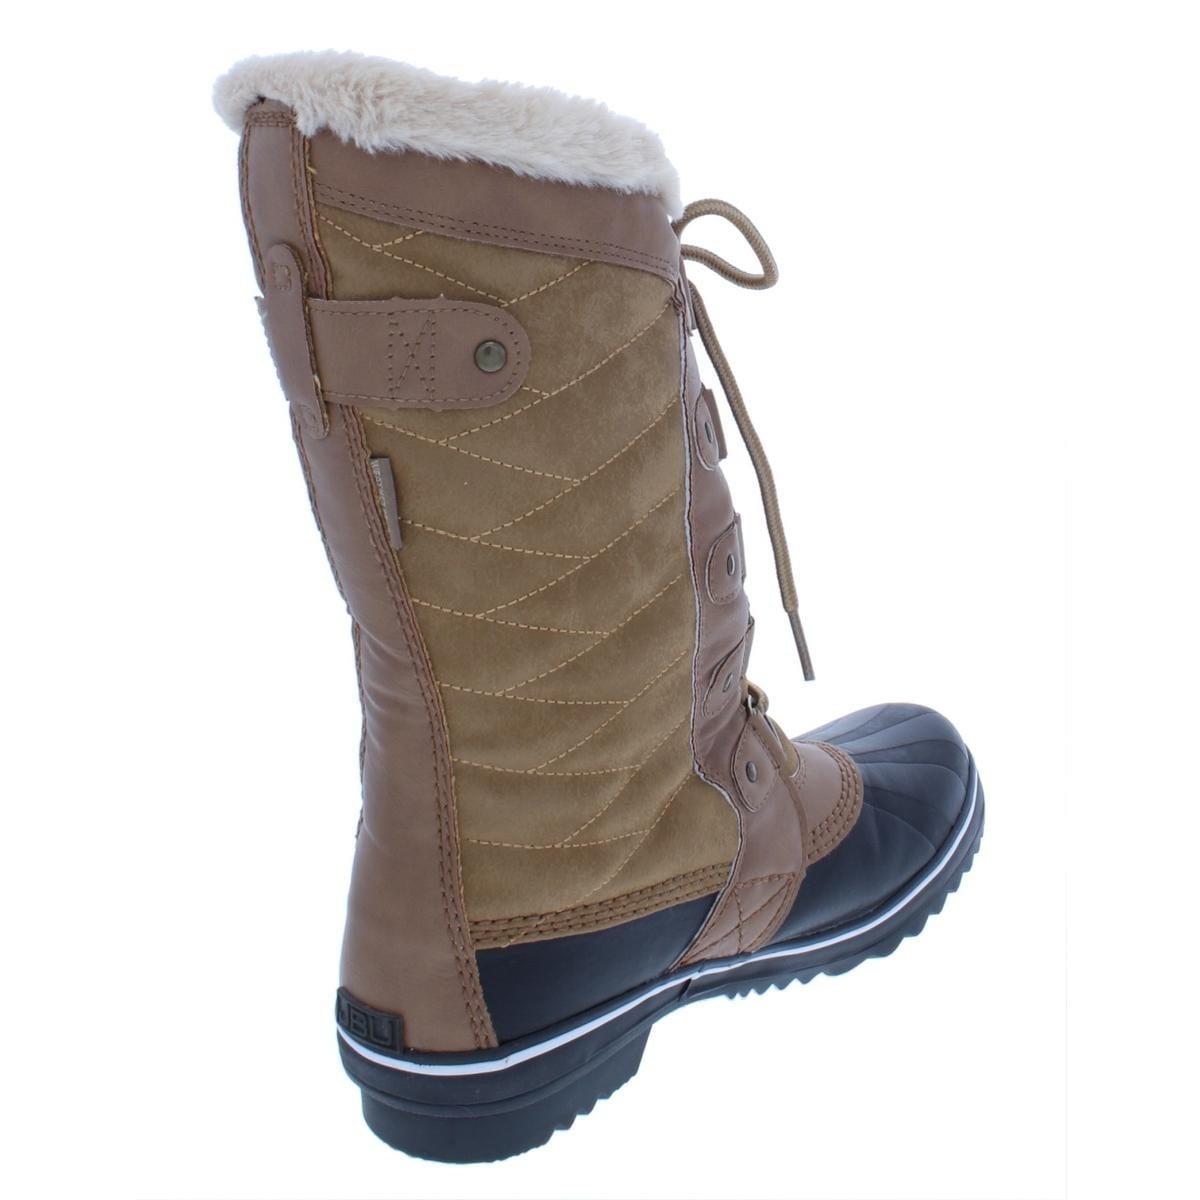 b11753acb16 JBU by Jambu Womens Lorna Winter Boots Cold Weather Mid-Calf